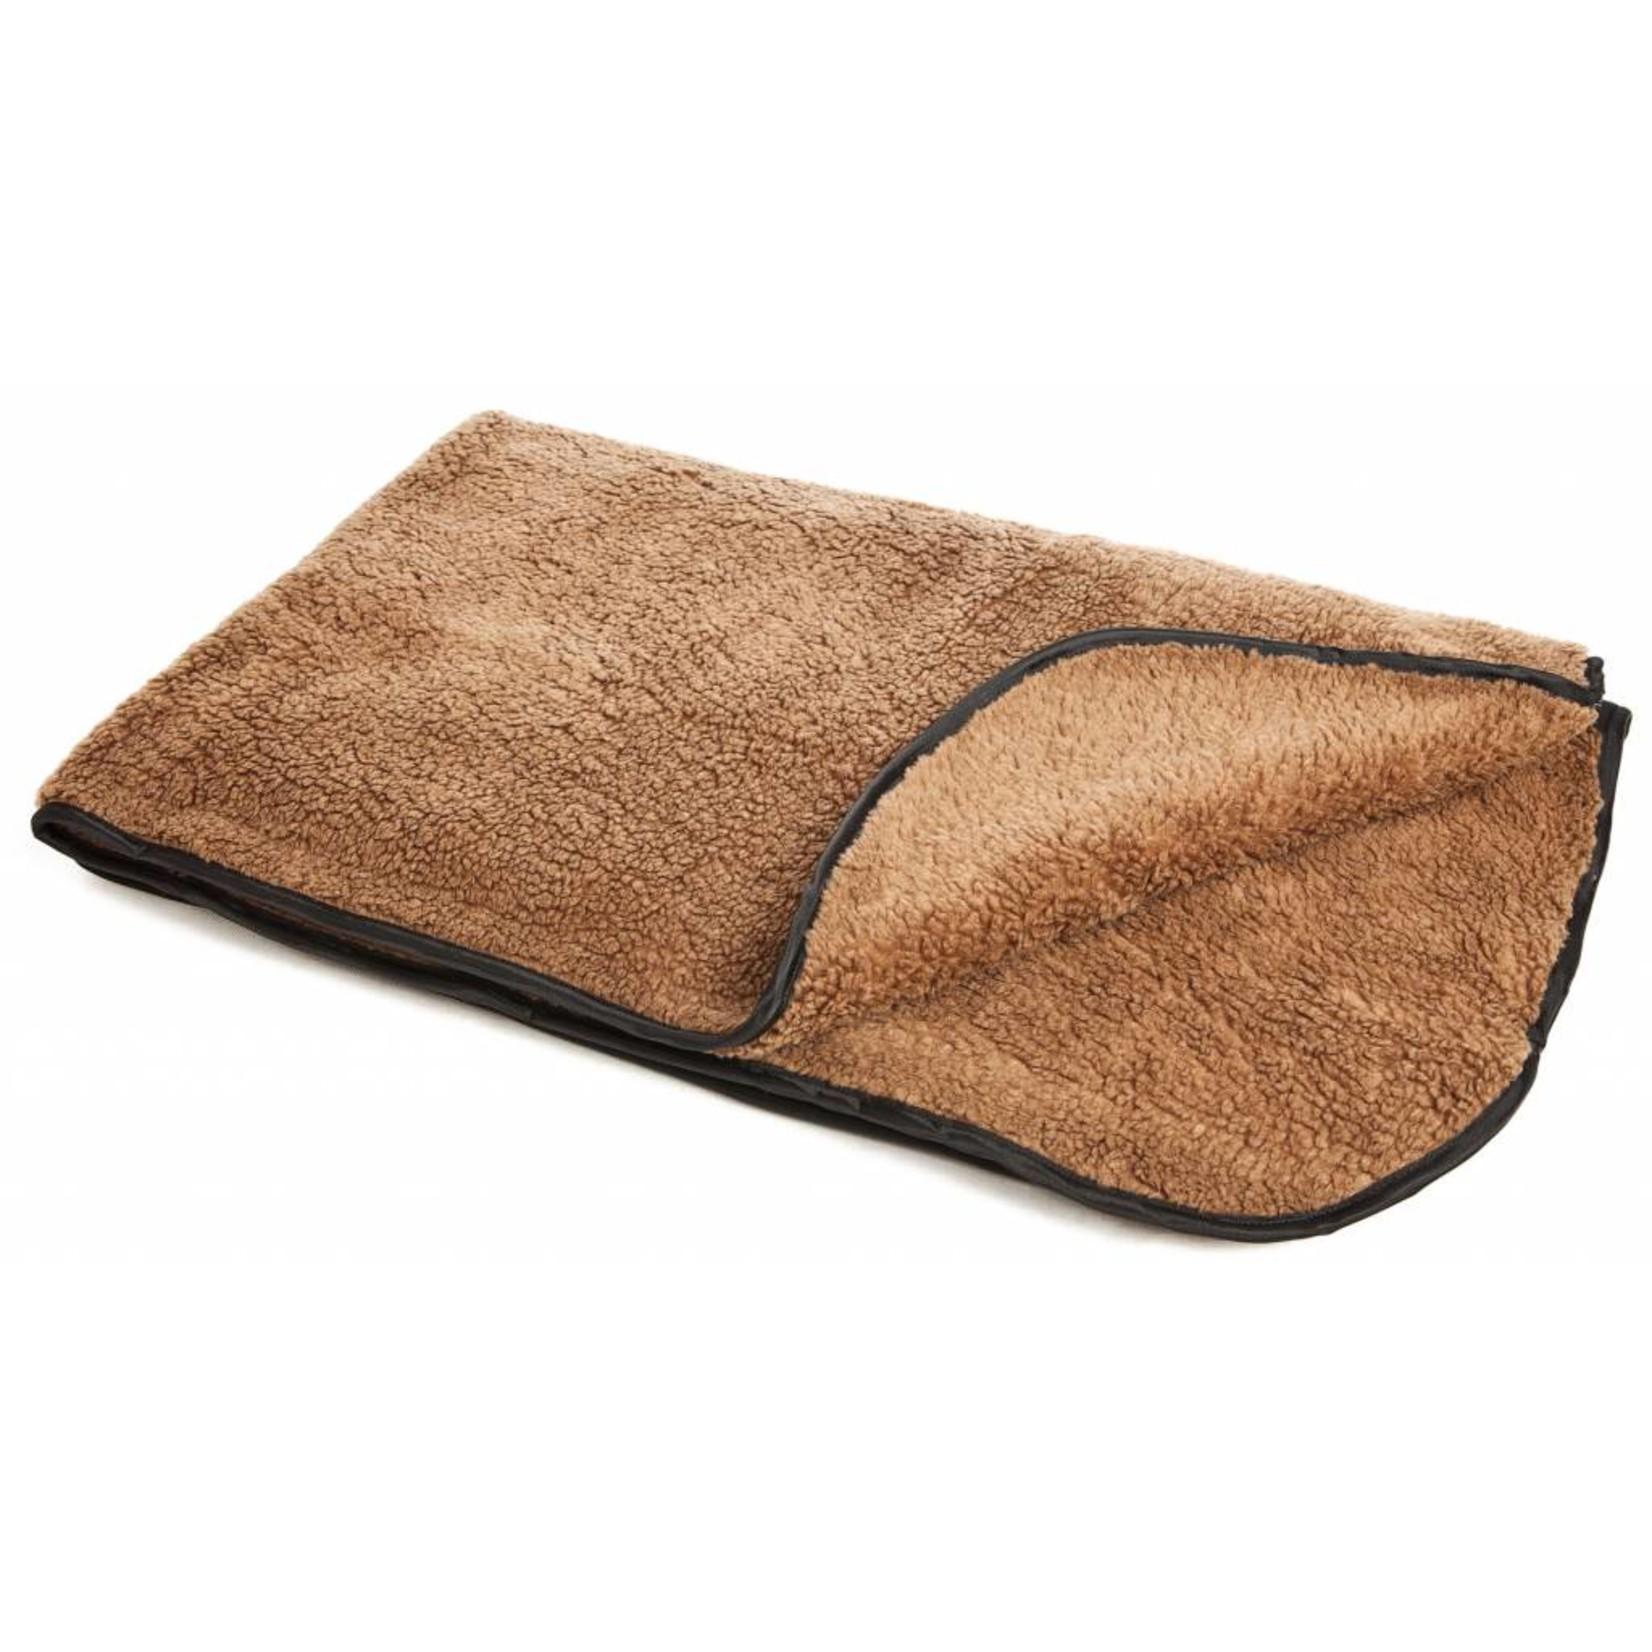 Pets & Leisure Double Thickness Sherpa Fleece Pet Blanket, Brown